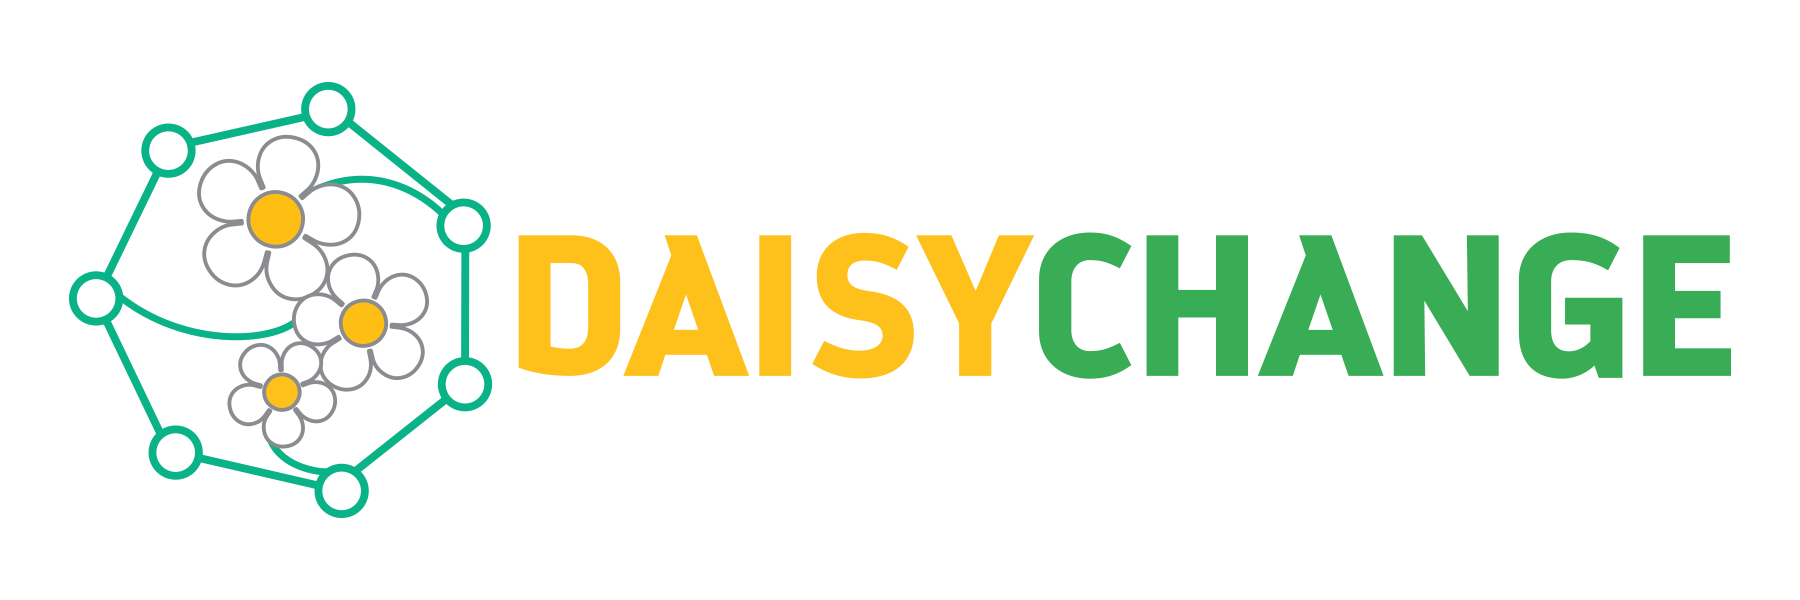 DaisyChange logo LG.png